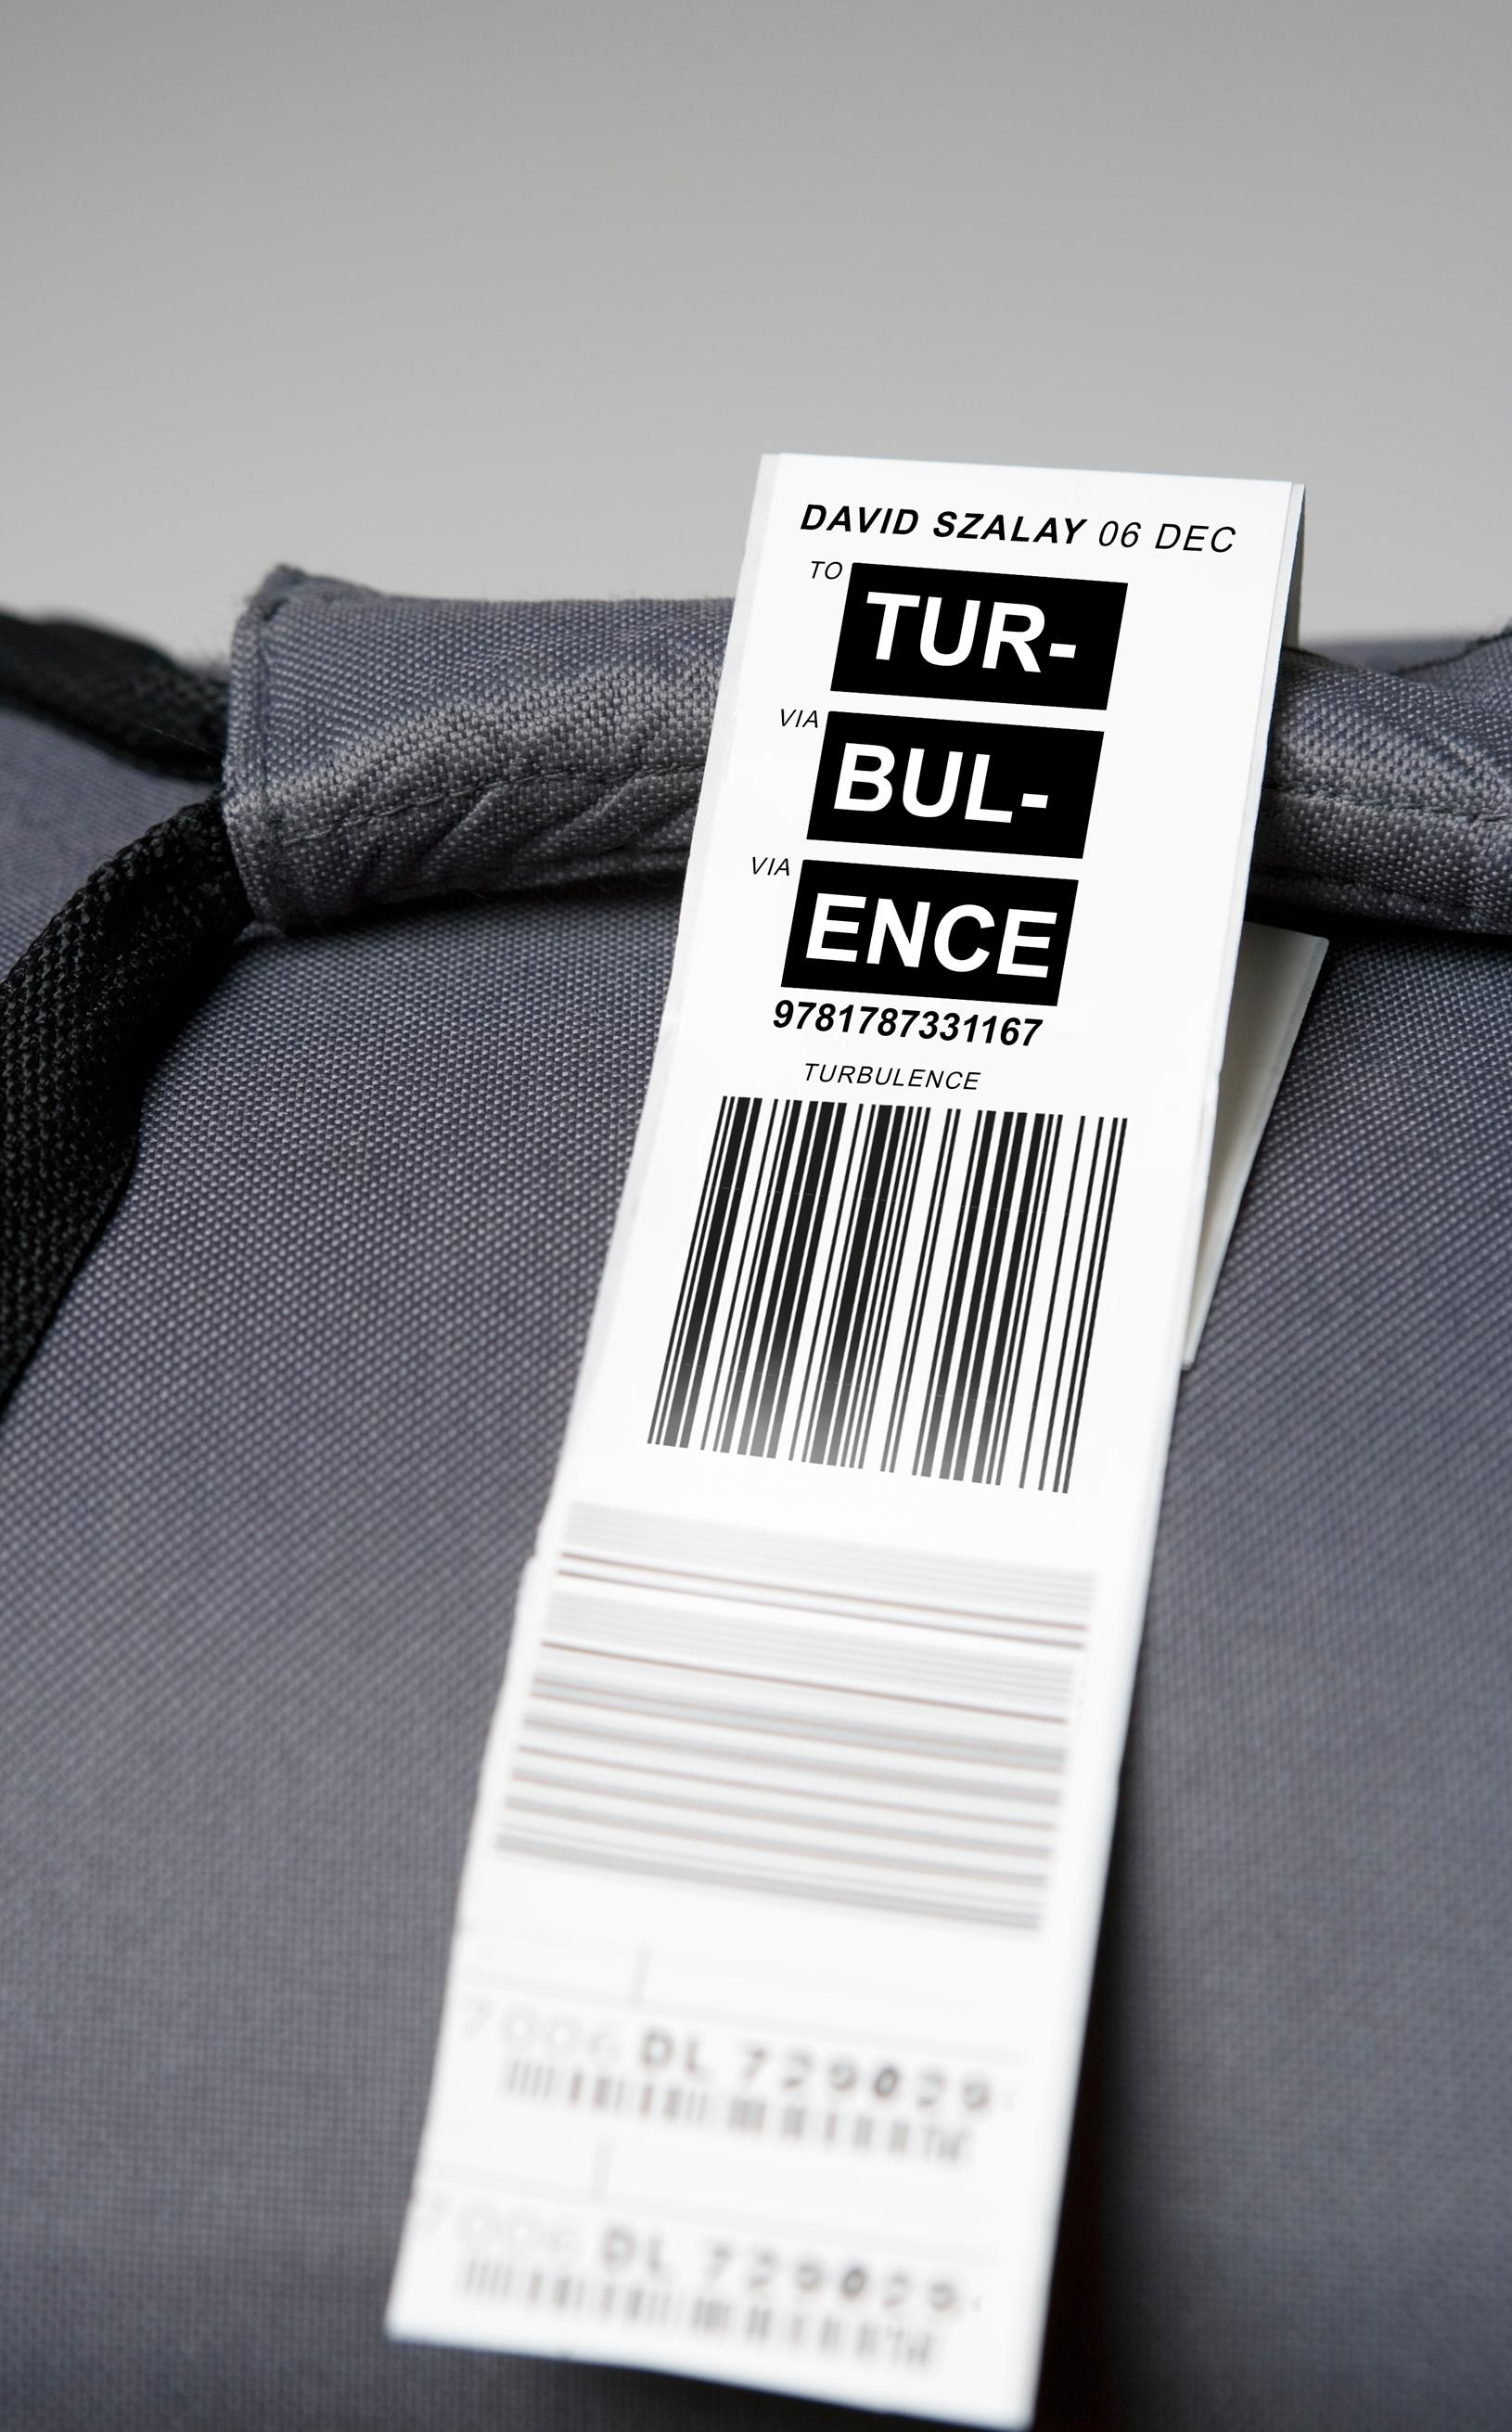 Turbulence Jpeg 5[4].jpg